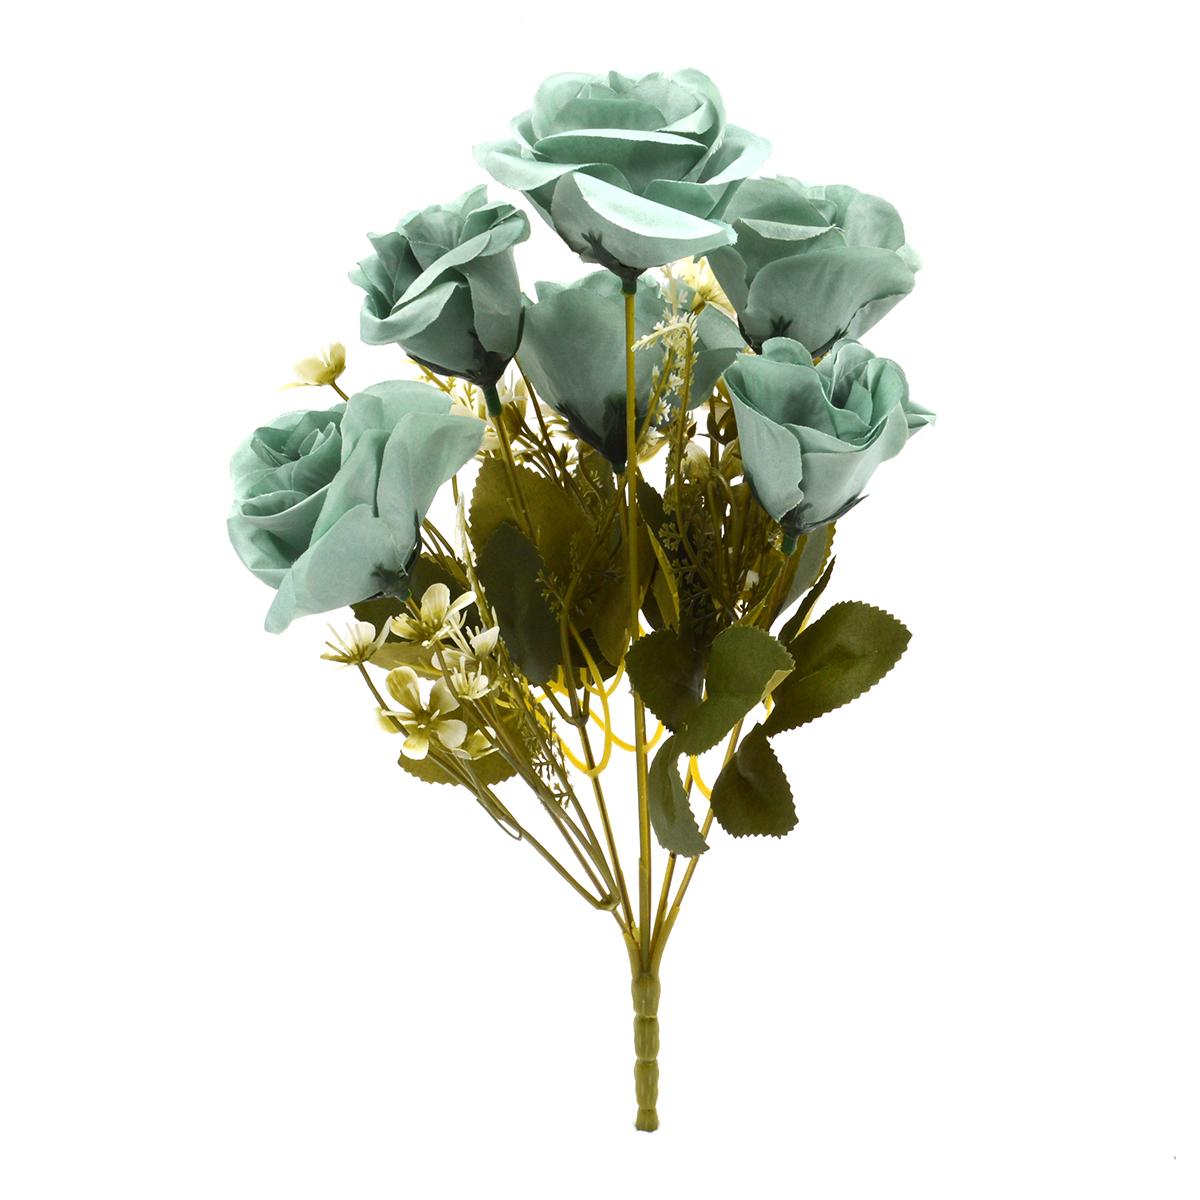 Flori Buchet 6 Trandafiri Madame turquoise inchis